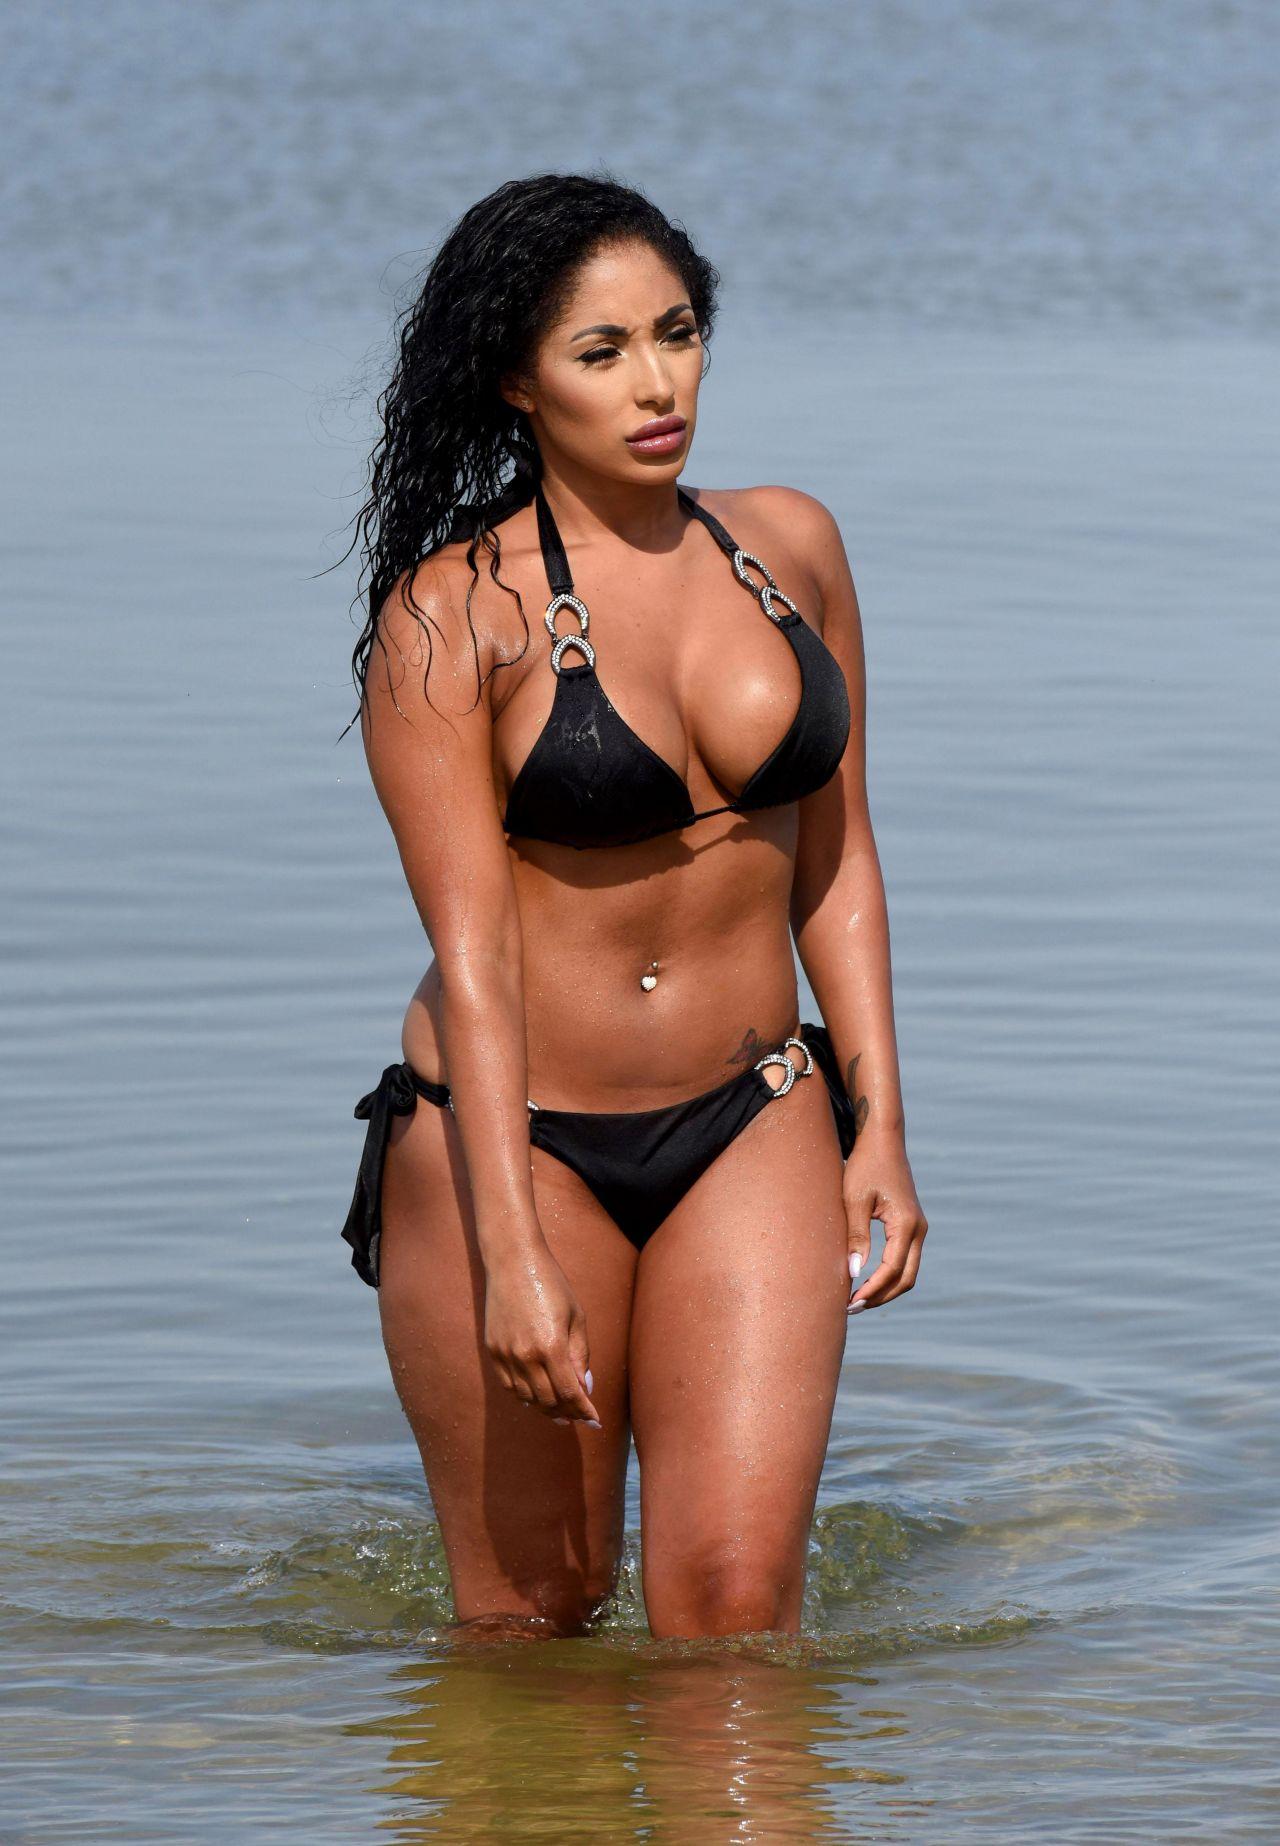 Chanelle Sadie Paul in Black Bikini on the beach in Murcia Pic 1 of 35